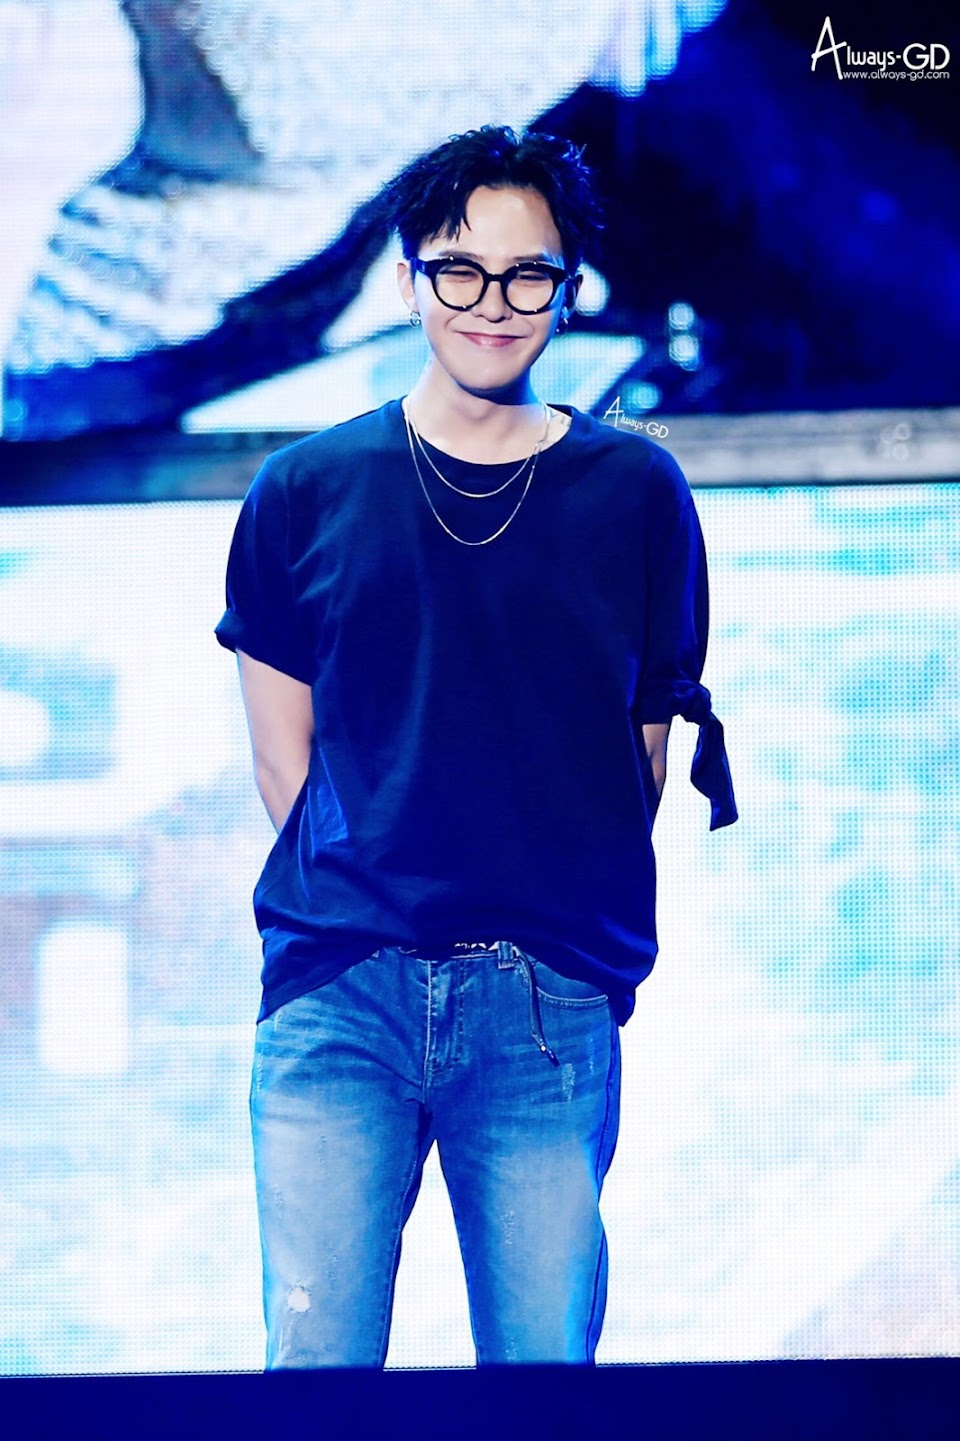 gdragon lee joo yeon dating rumor 1